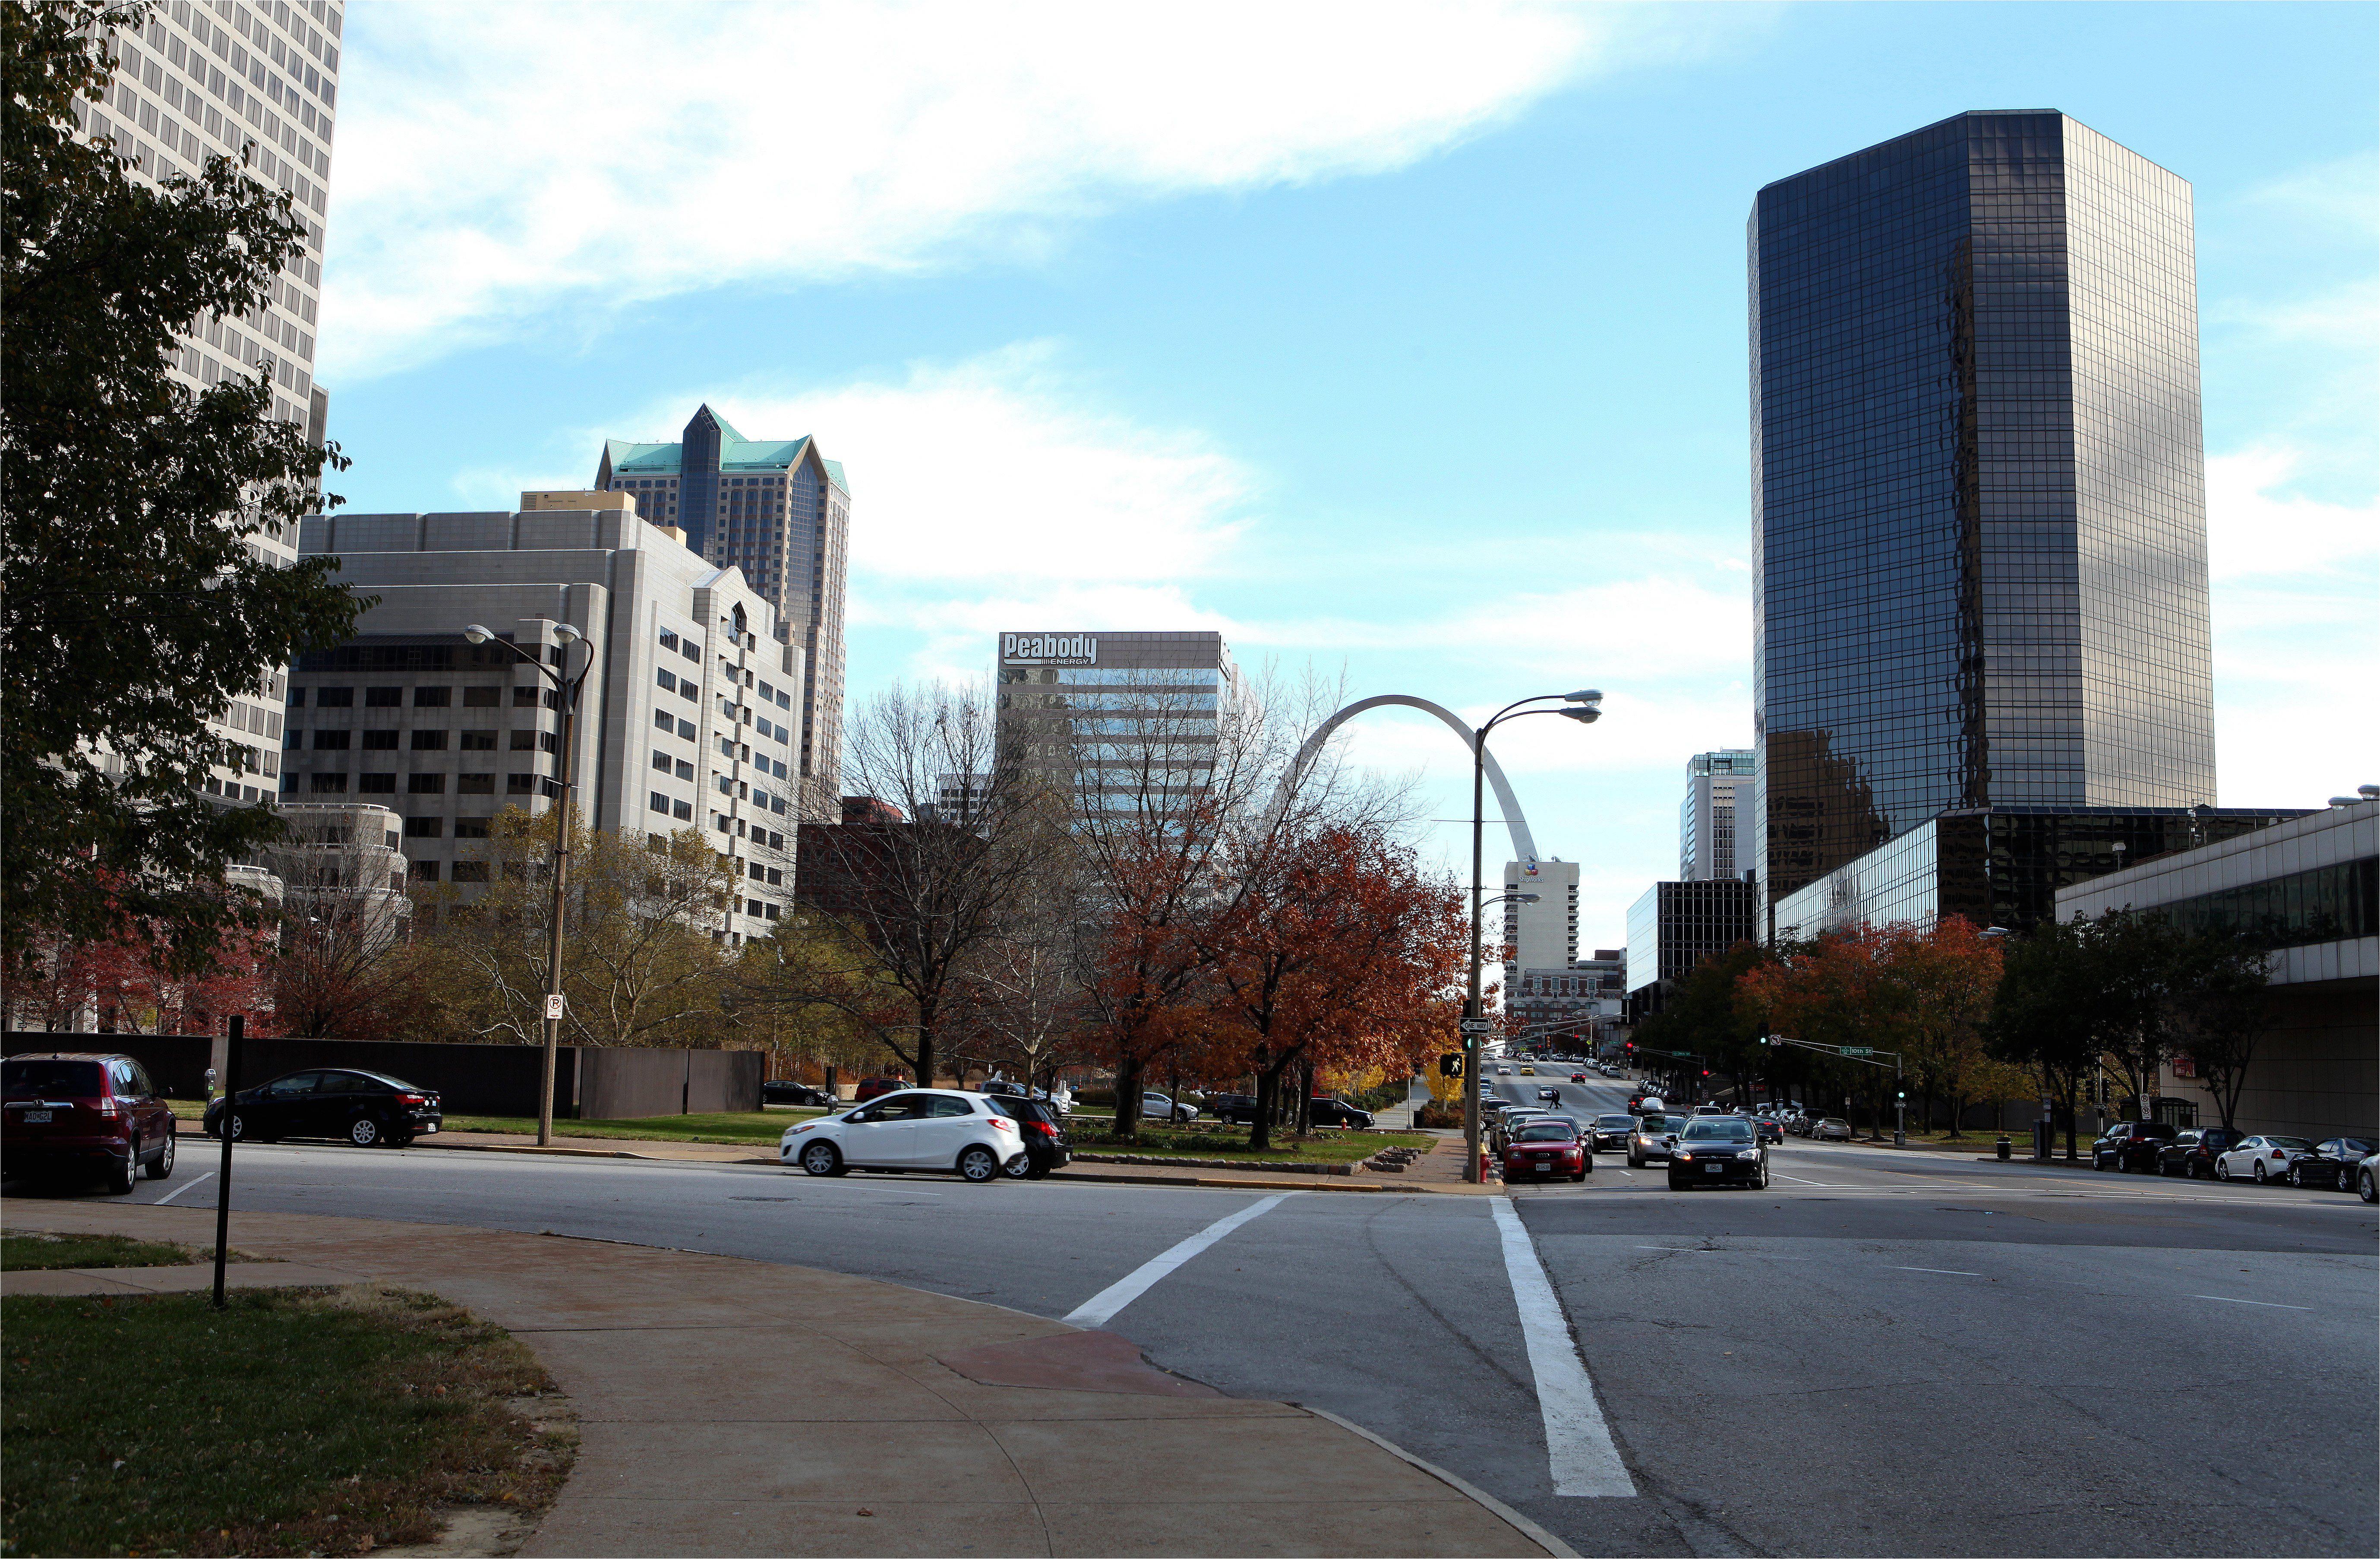 st louis cityscapes and city views 499300428 5b0c8ec63418c600386fd2ff jpg